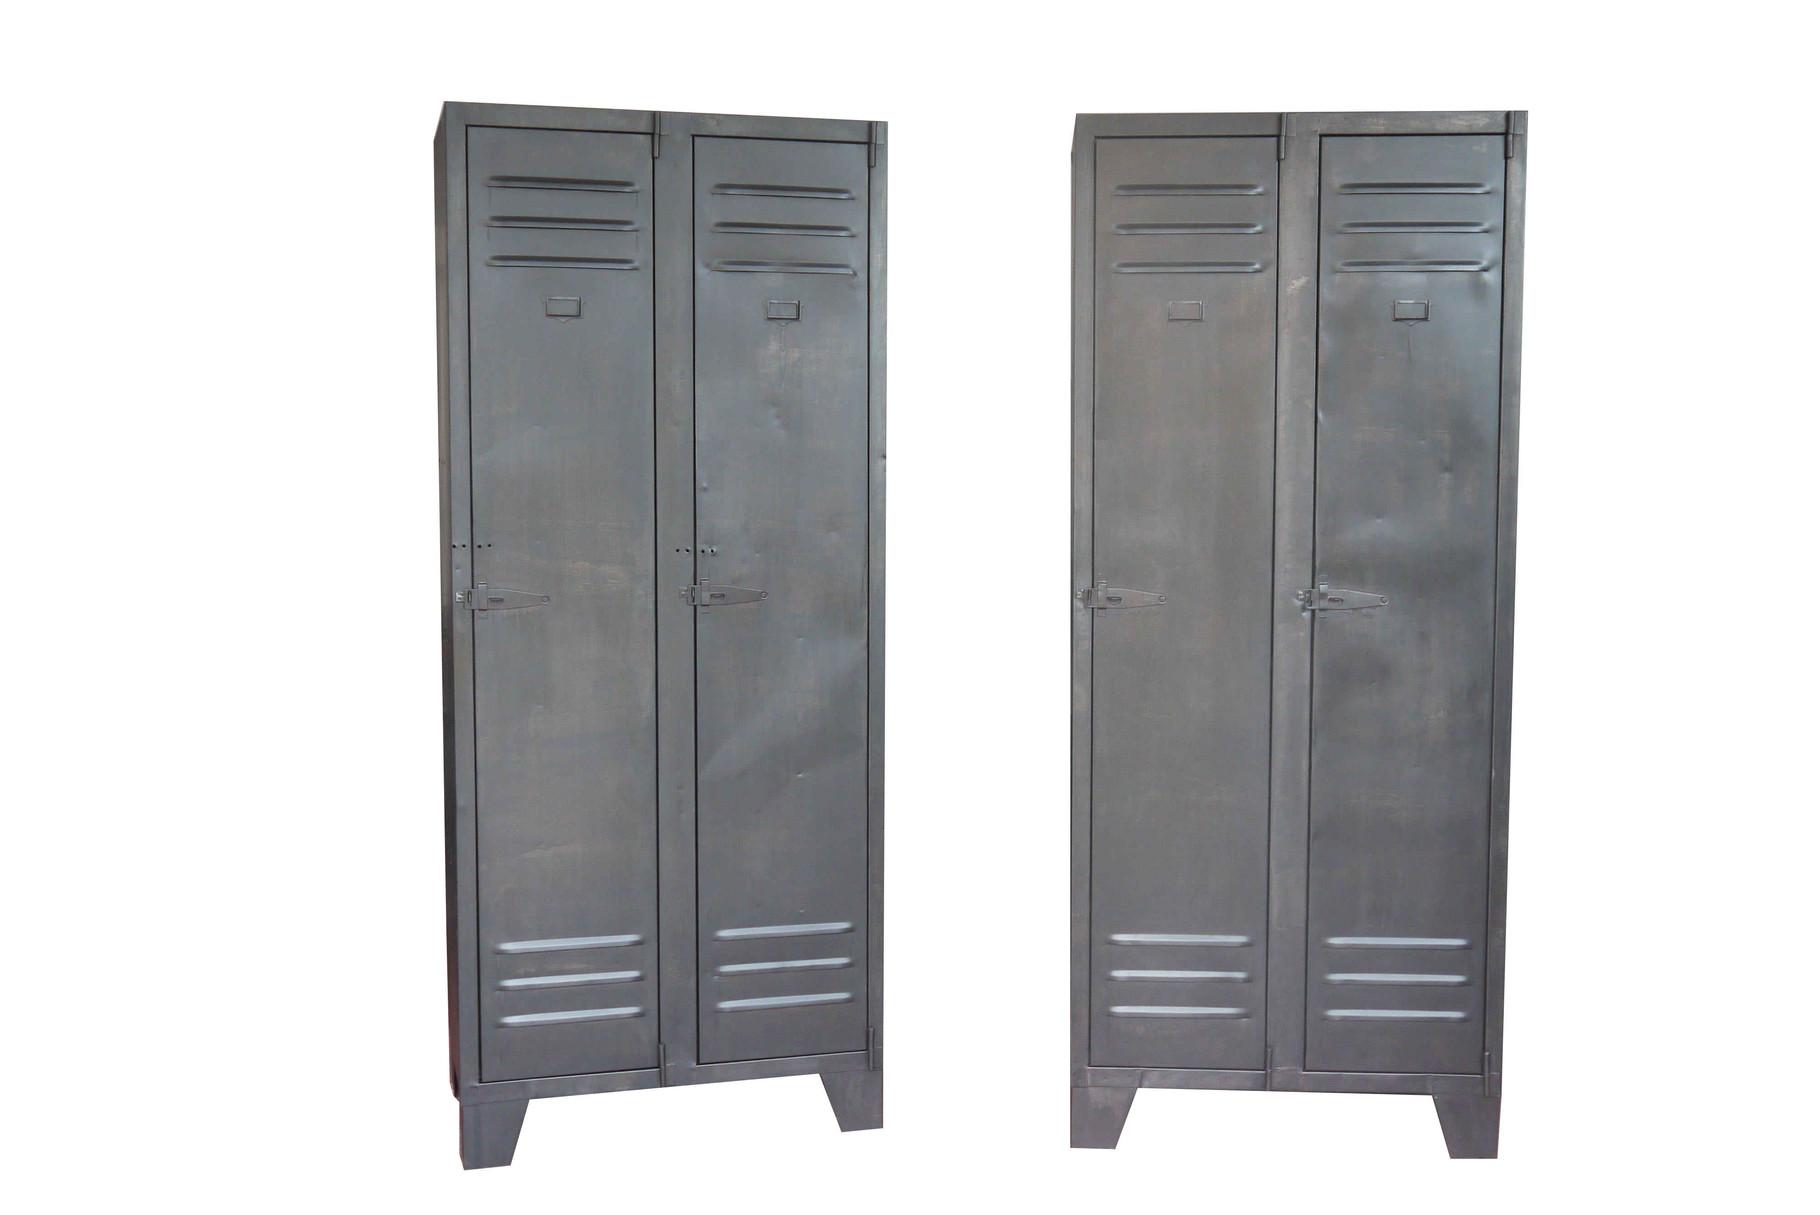 atelier vintage atelier vintage mobilier industriel lyon. Black Bedroom Furniture Sets. Home Design Ideas